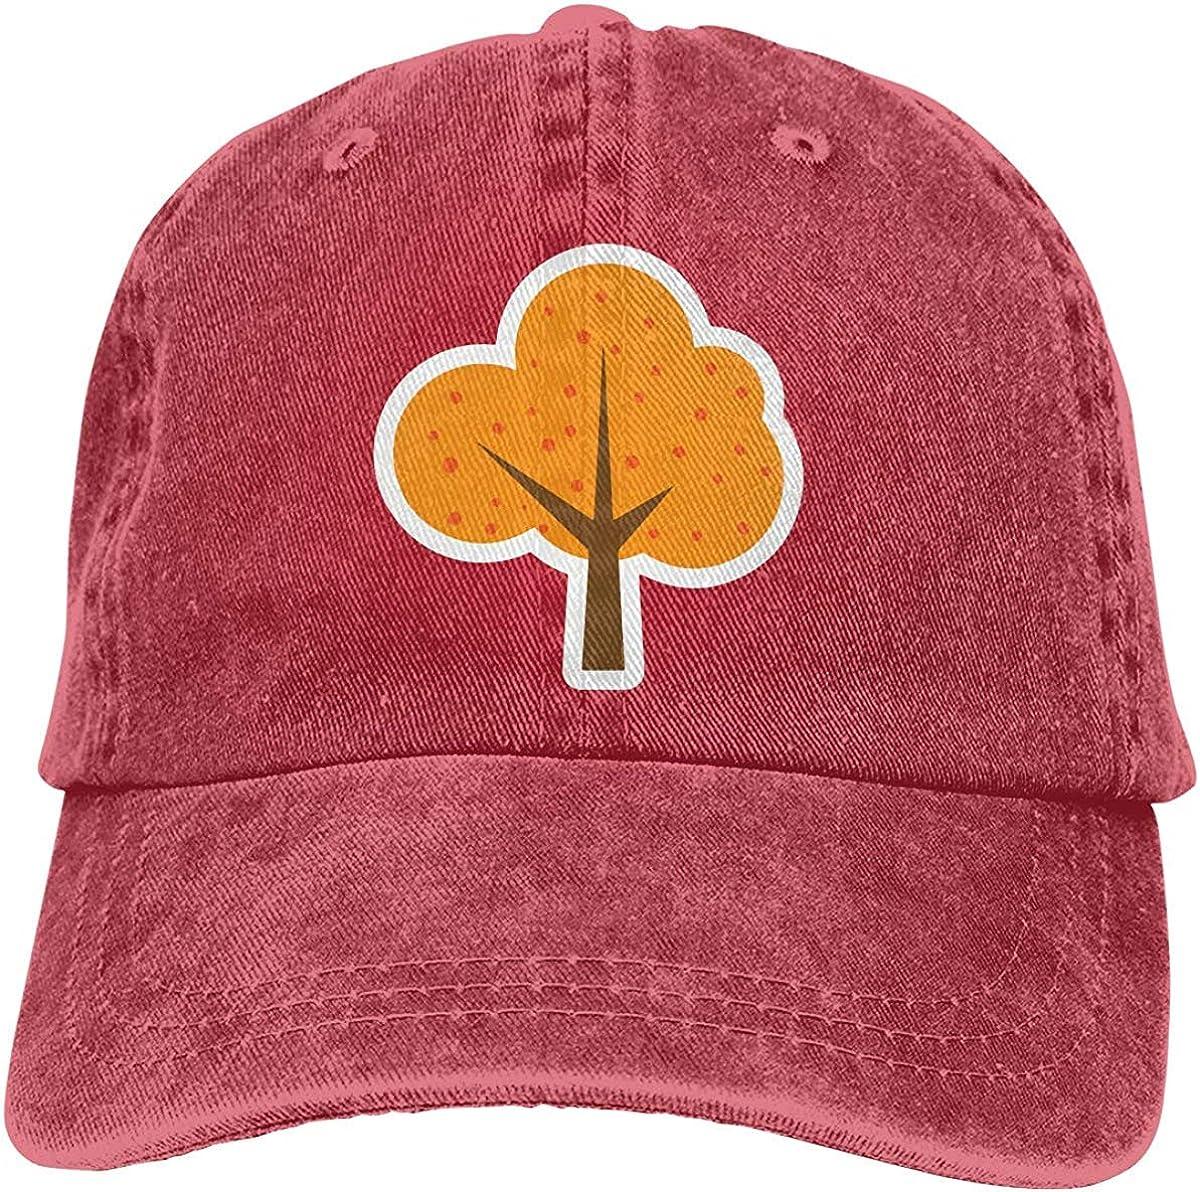 SDHEIJKY Men Women Distressed Denim Fabric Baseball Cap Orange Tree Plant Trucker Cap